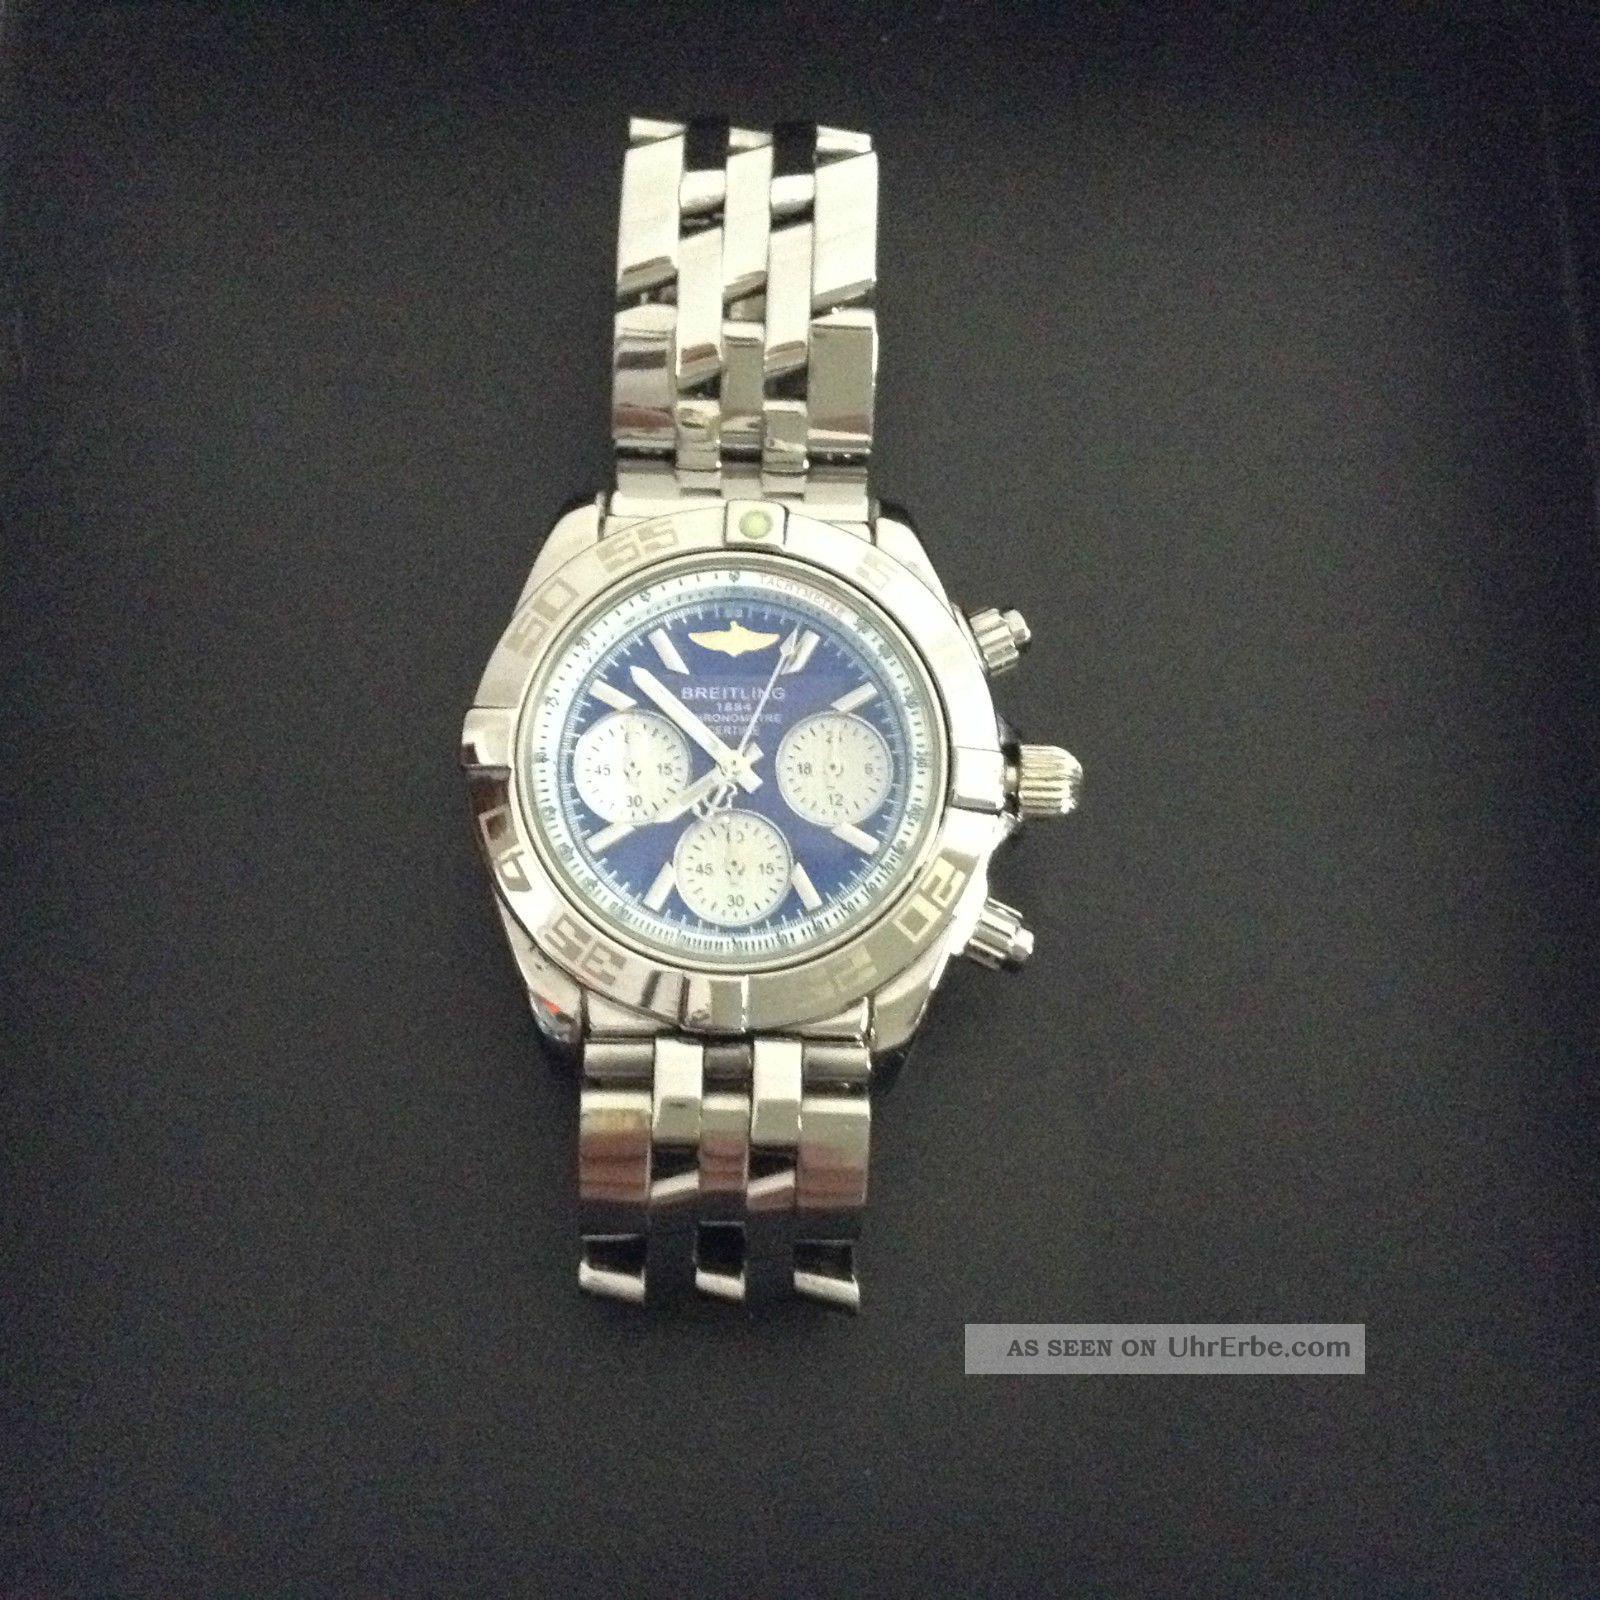 Schöne Damenarmbanduhr Mit Edelstahlarmband Armbanduhren Bild